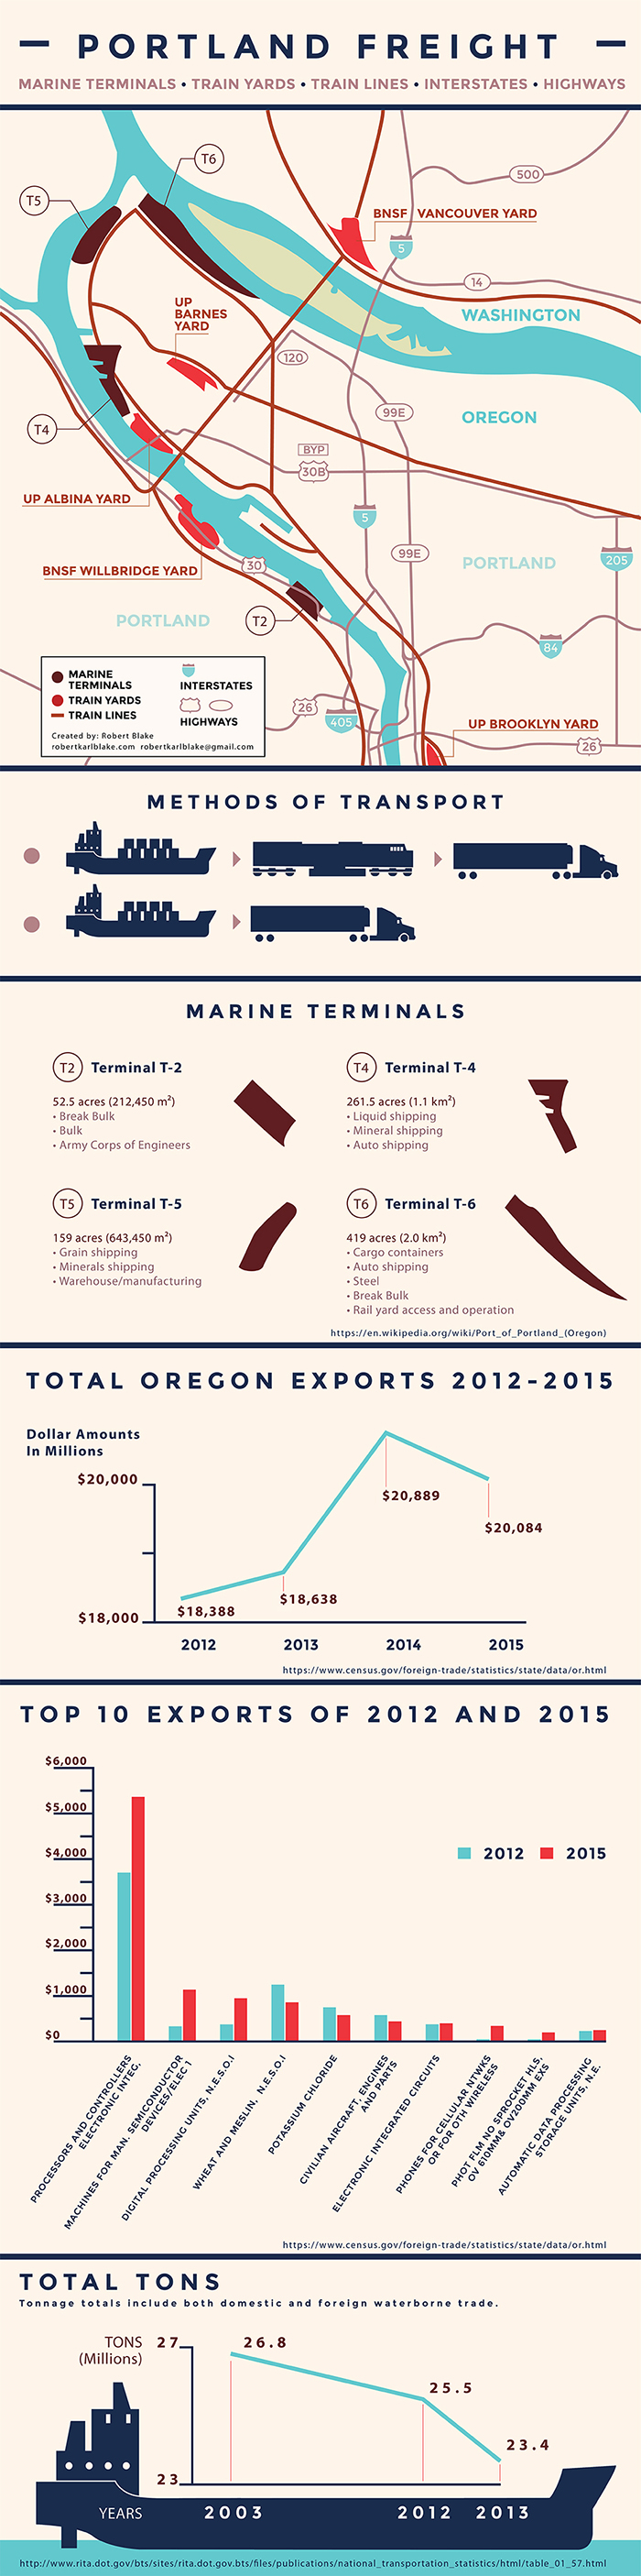 portland freight.jpg